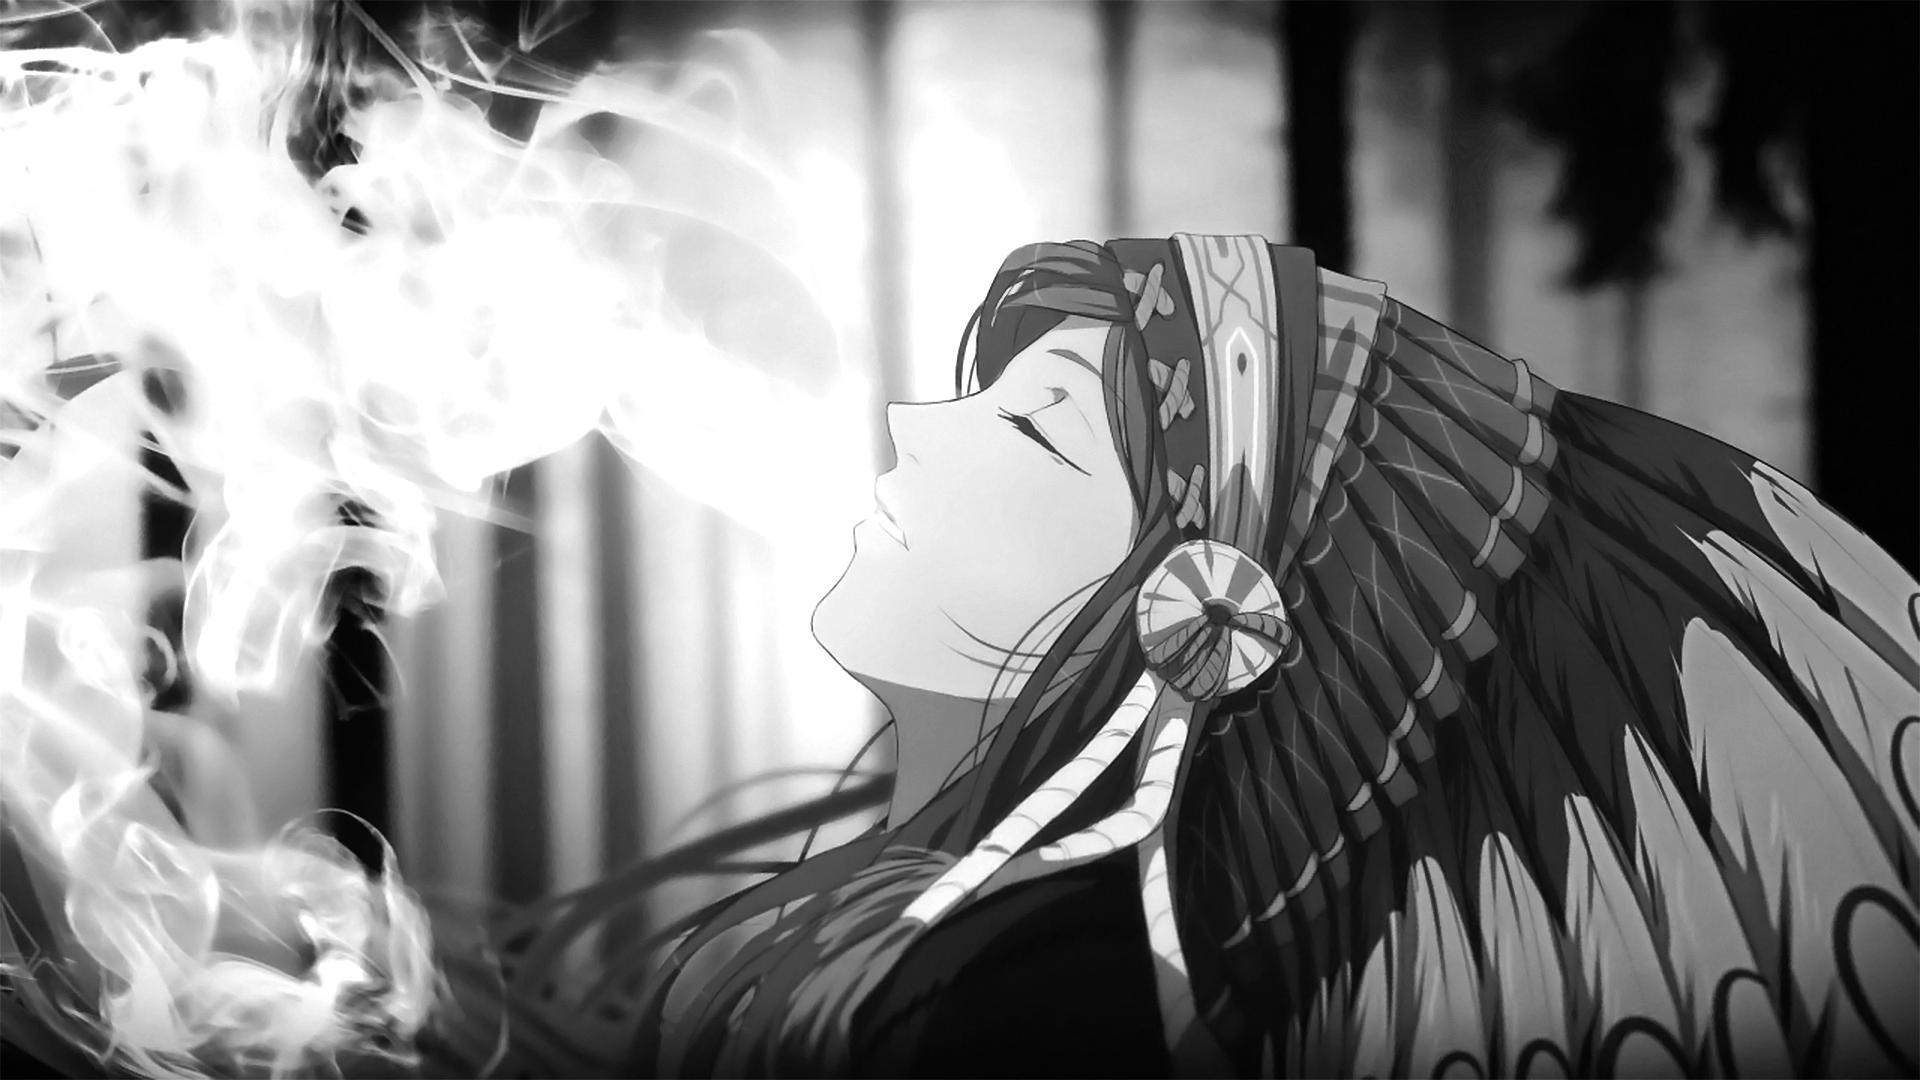 Download Hd Anime Girls Smoke Headdress Monochrome Anime Desktop Background Images Download Wallpaper Hd Background Images